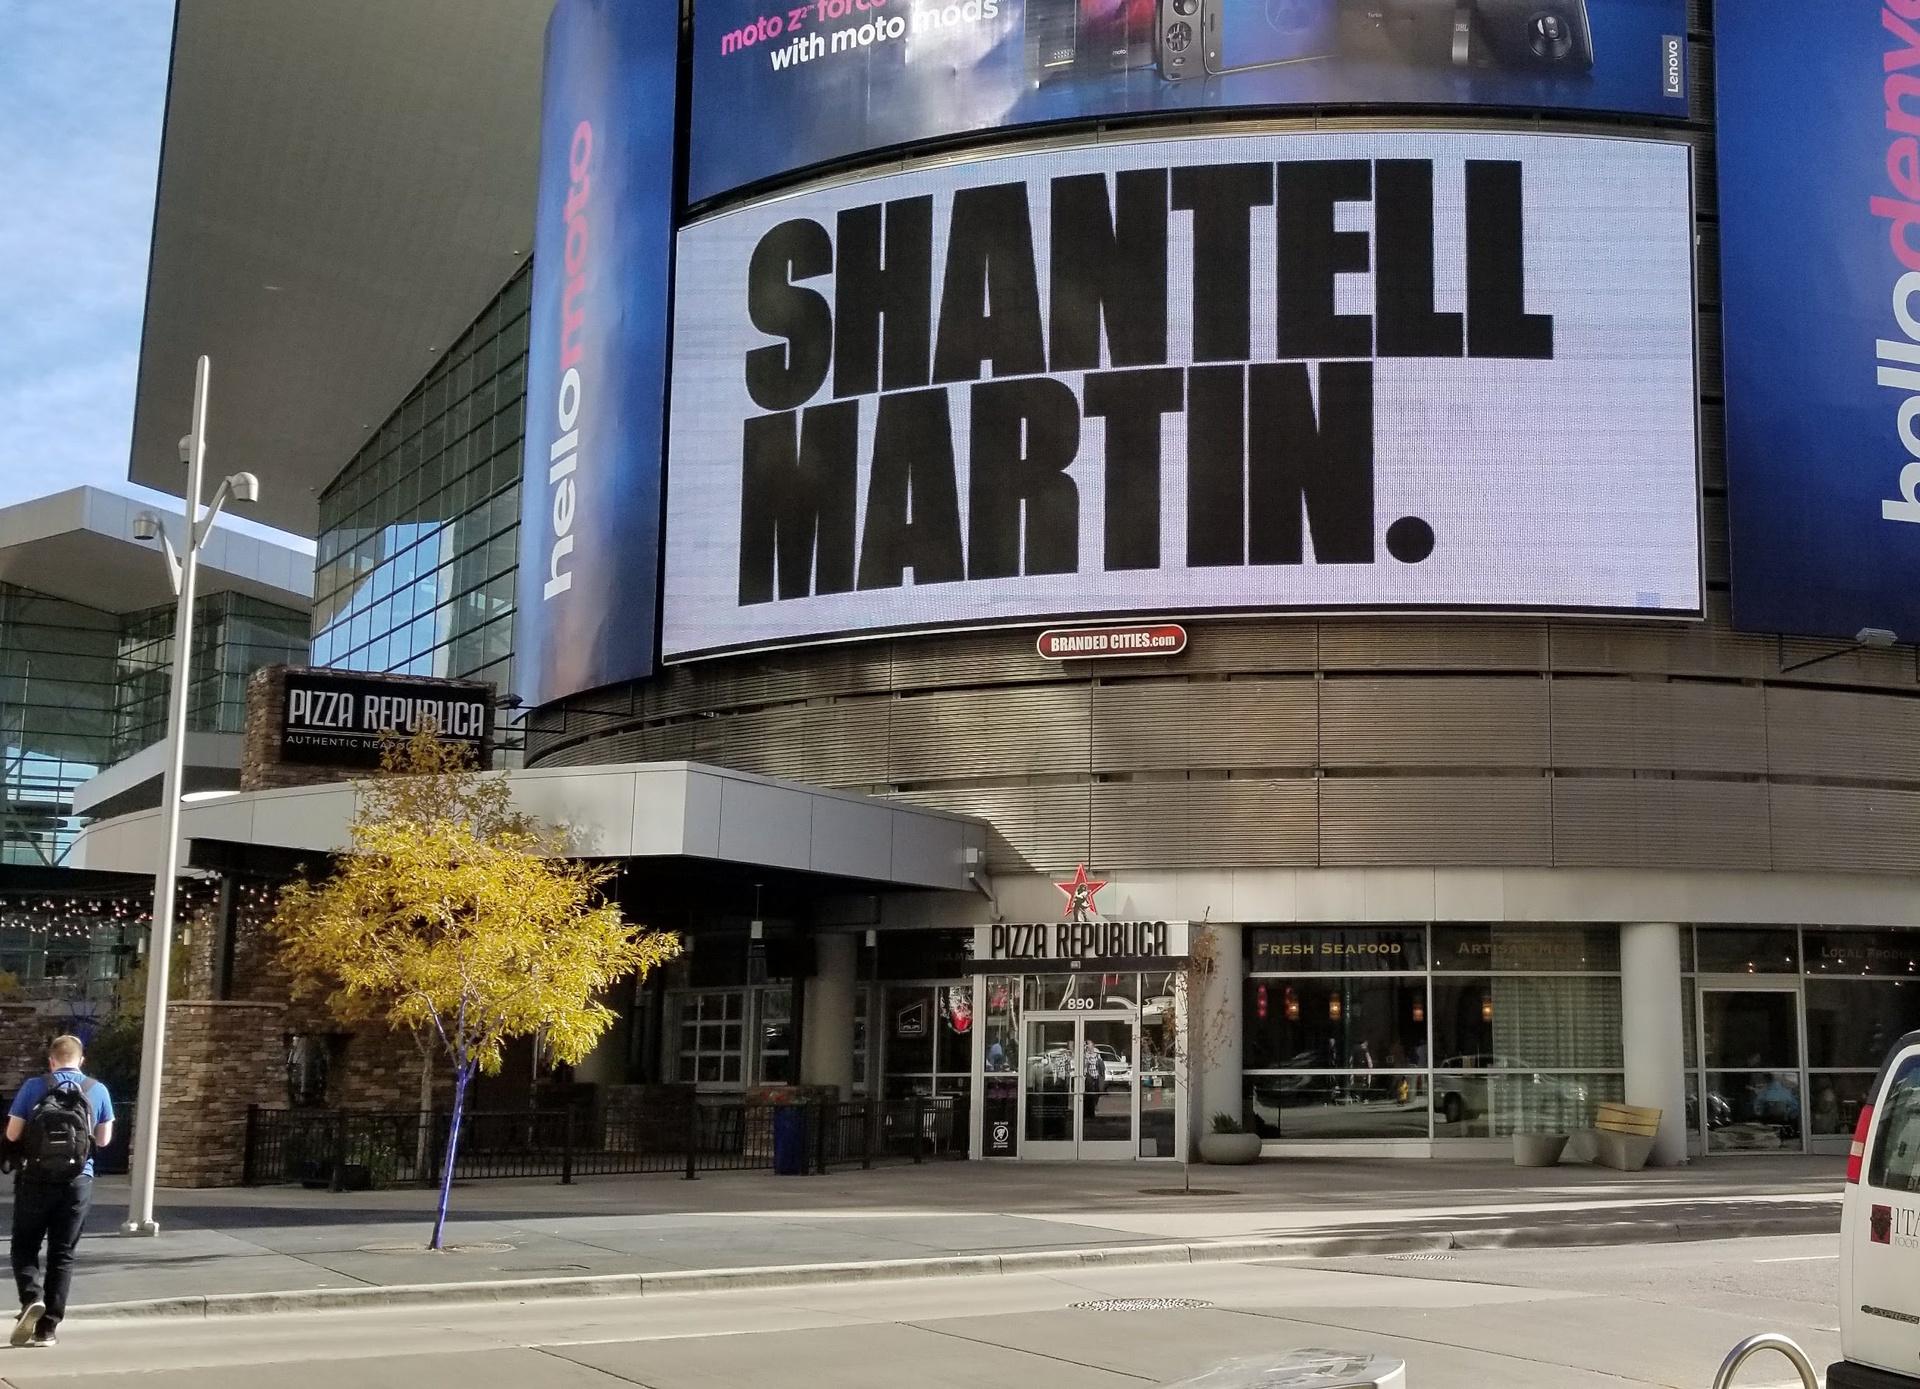 Shantell martin news denver theatre district public art for Craft show denver convention center